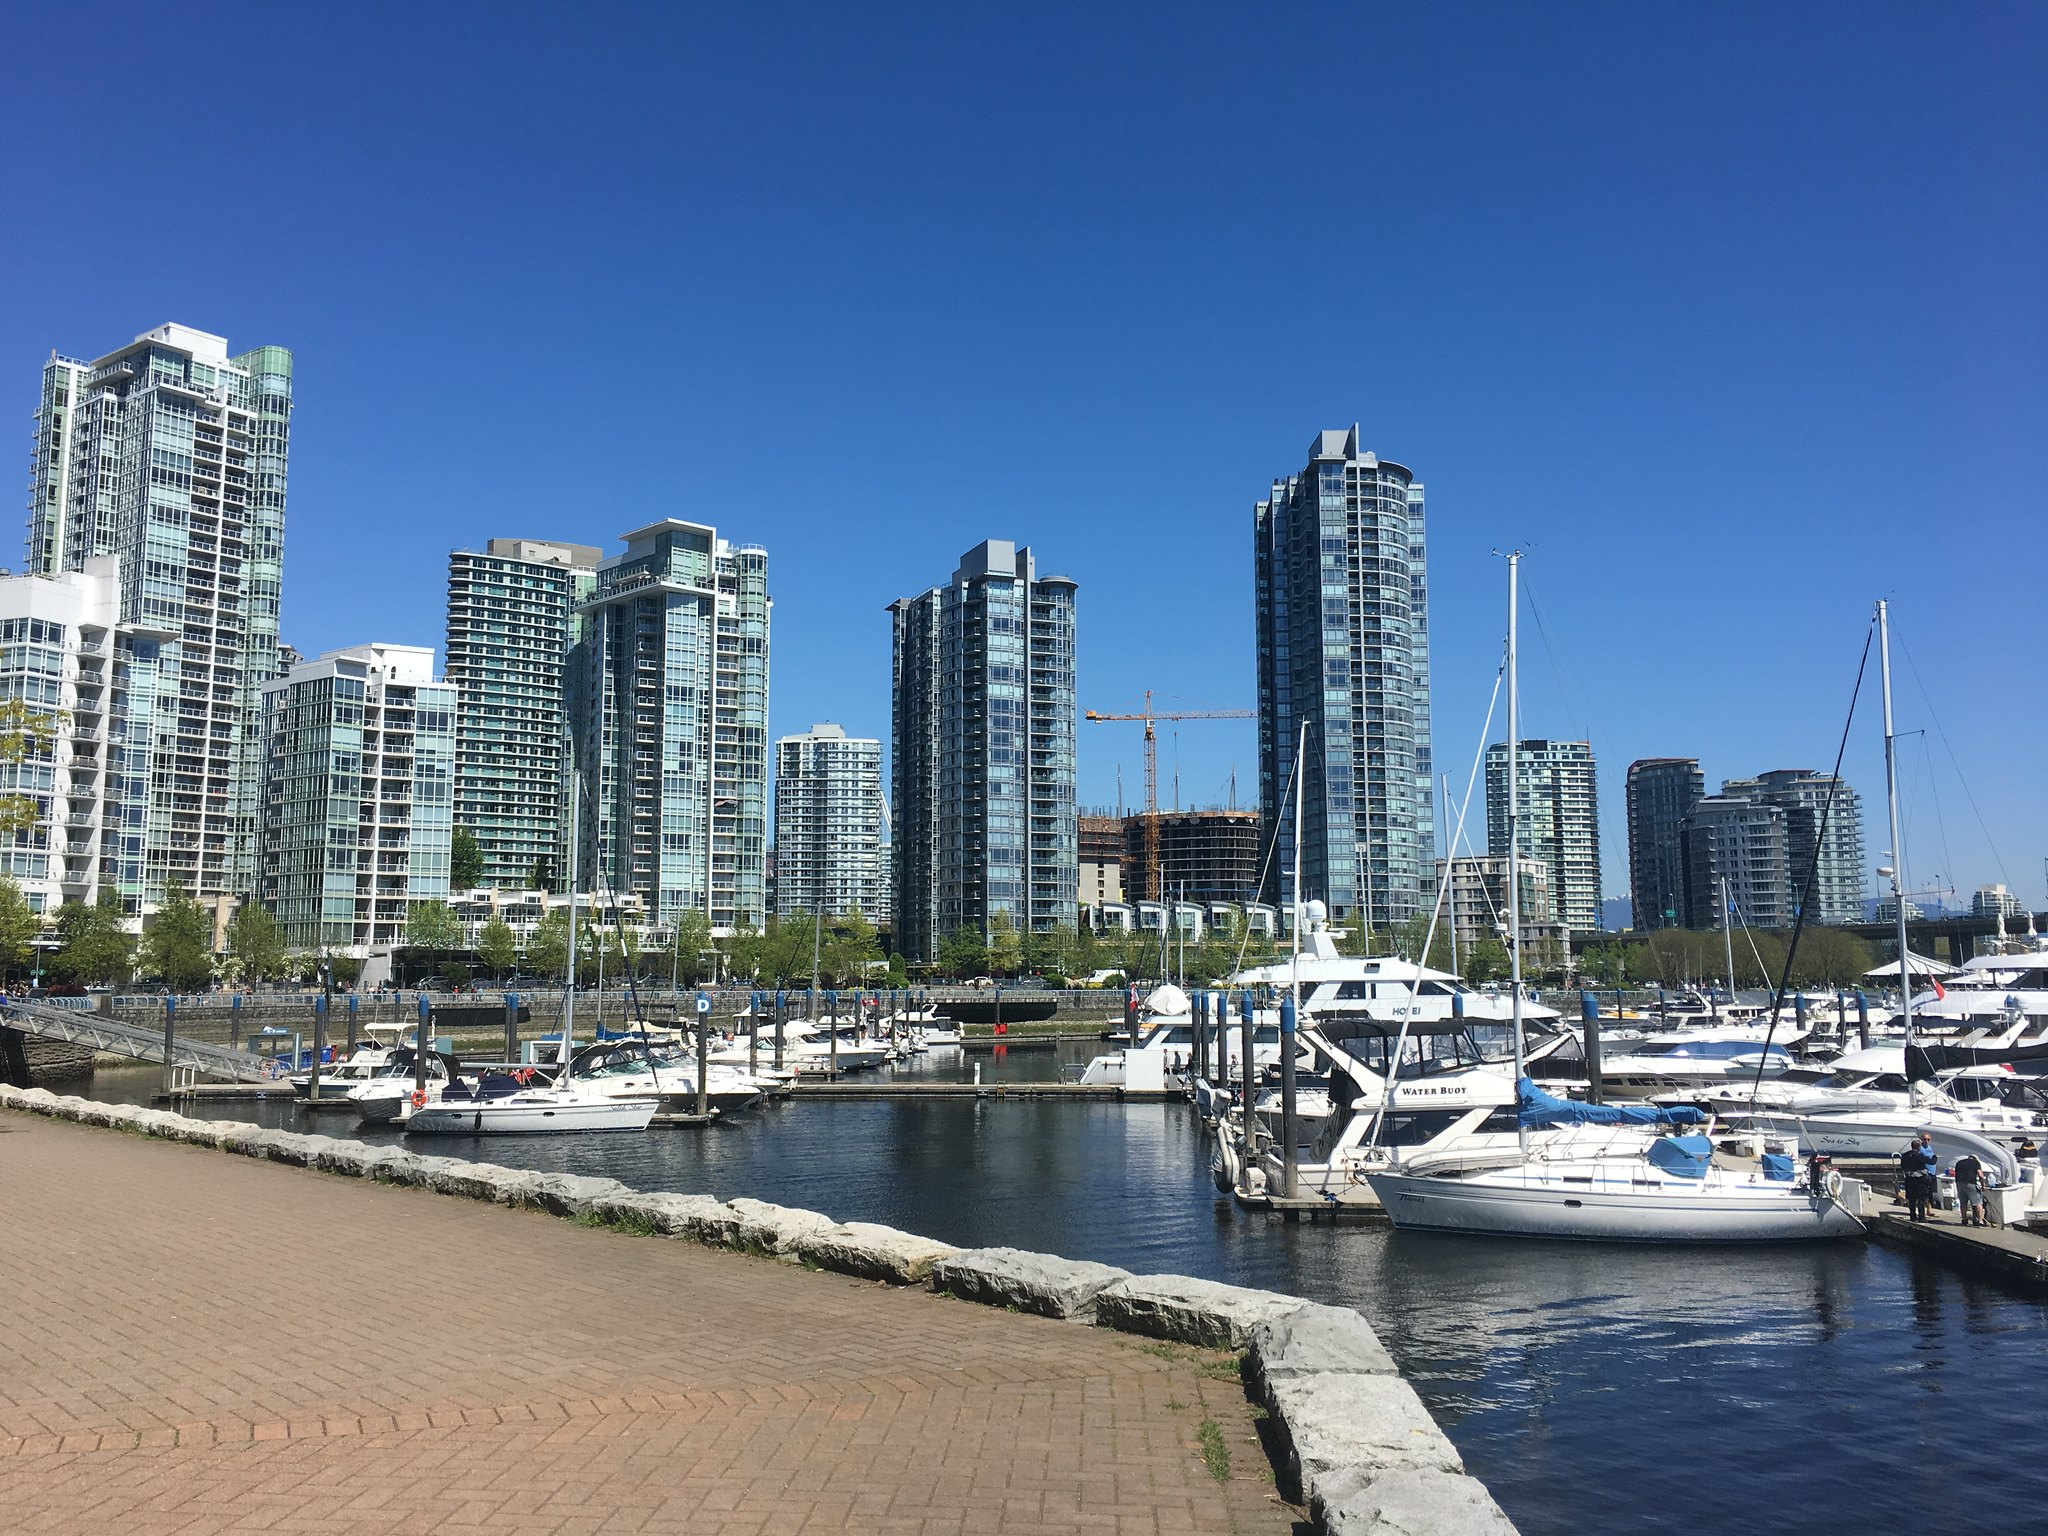 Vancouver rannikko